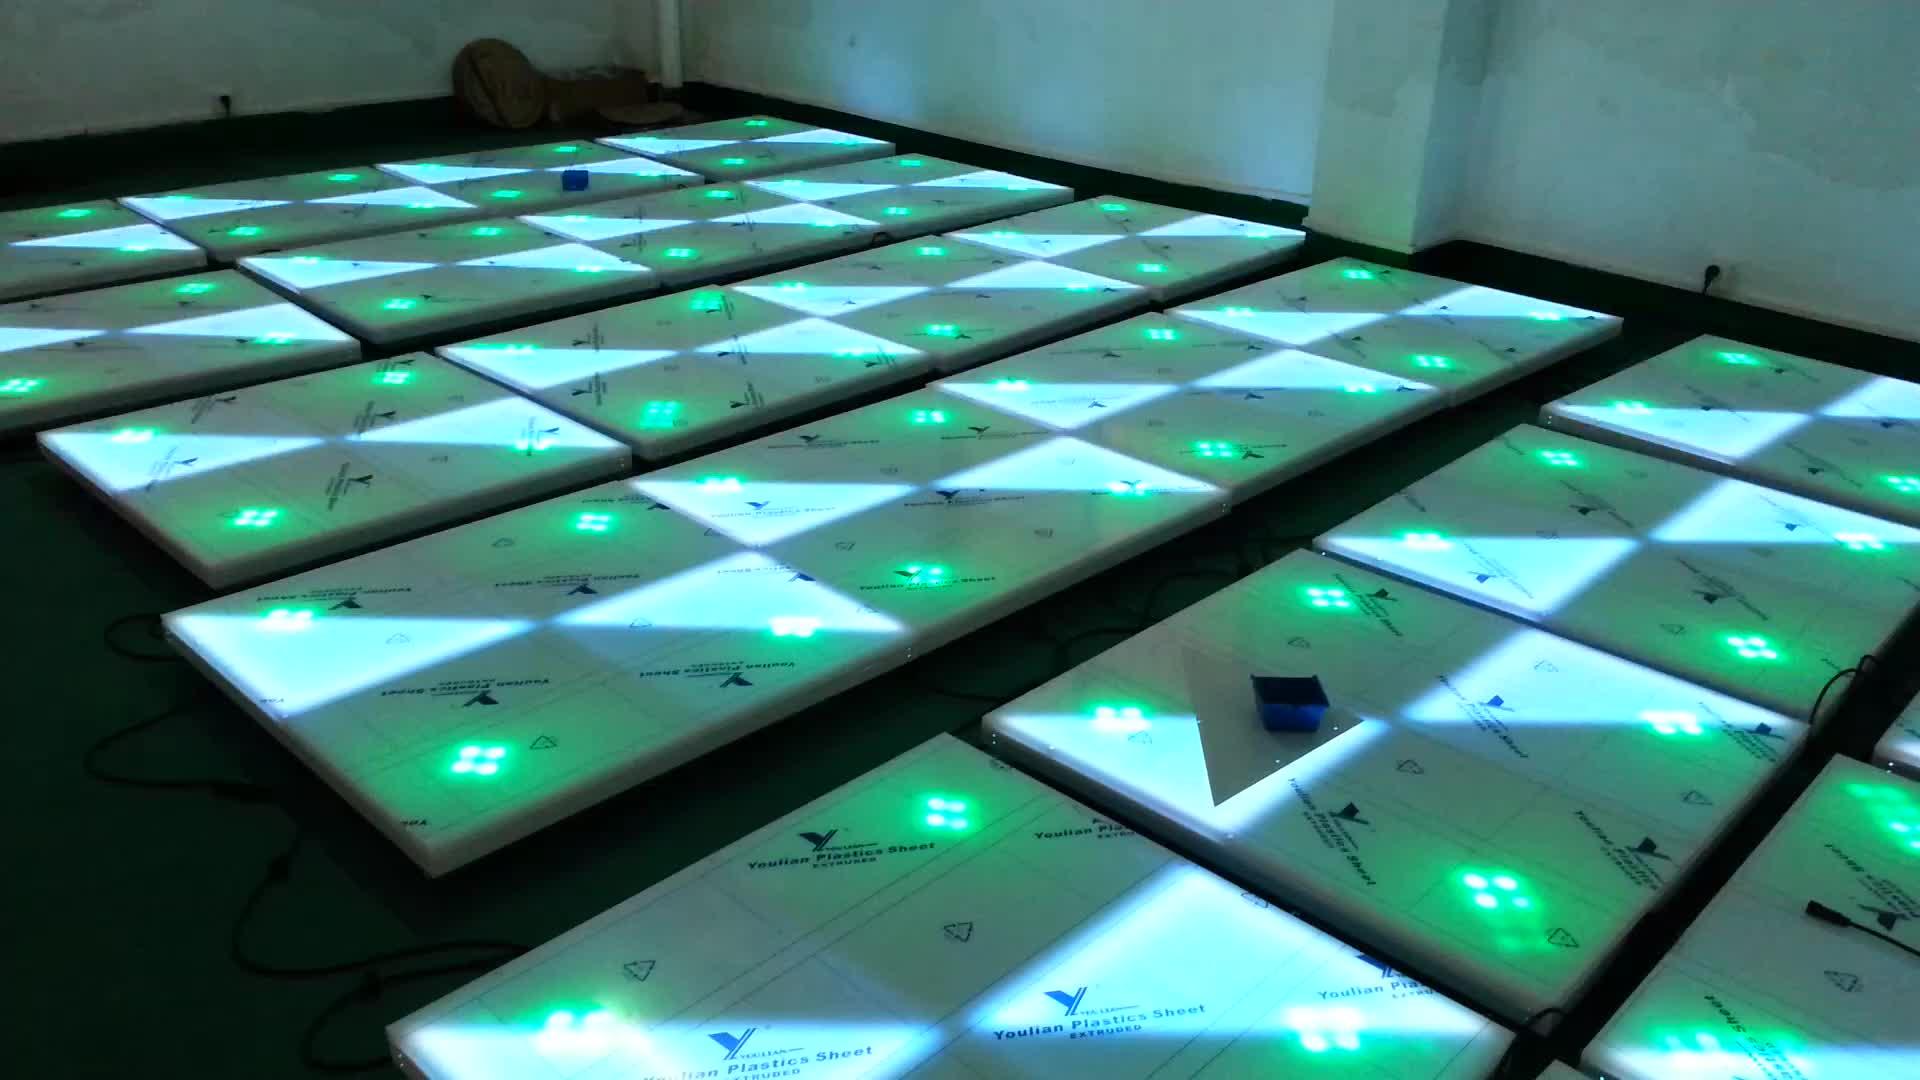 Led Dance Floor Lighted Disco Floor Lights Tiles Rgb Illuminating